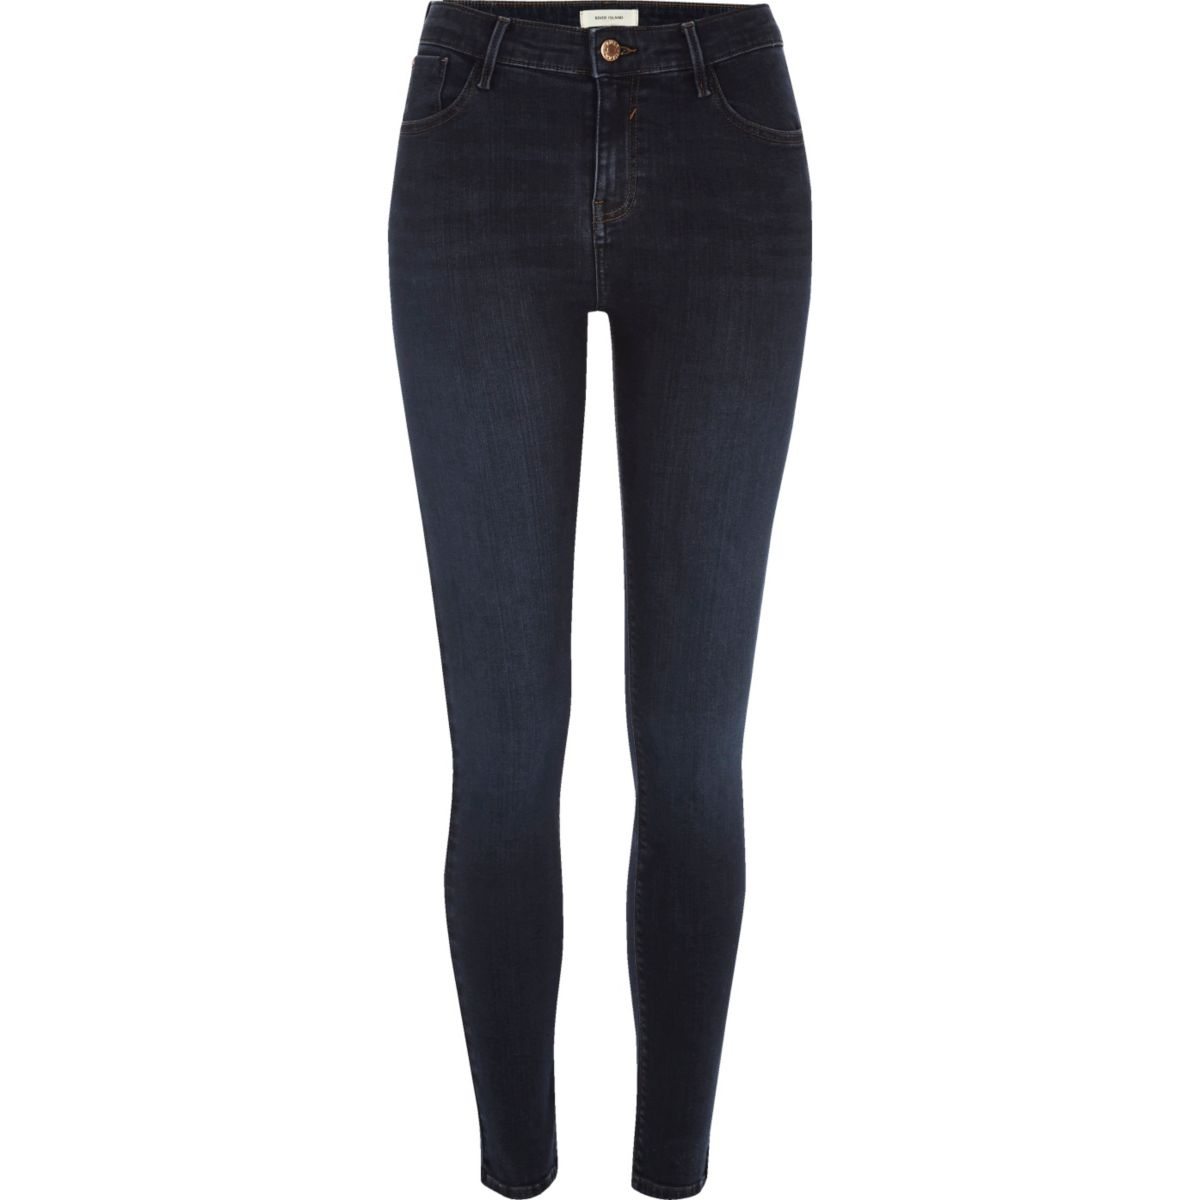 Dark wash Amelie super skinny jeans